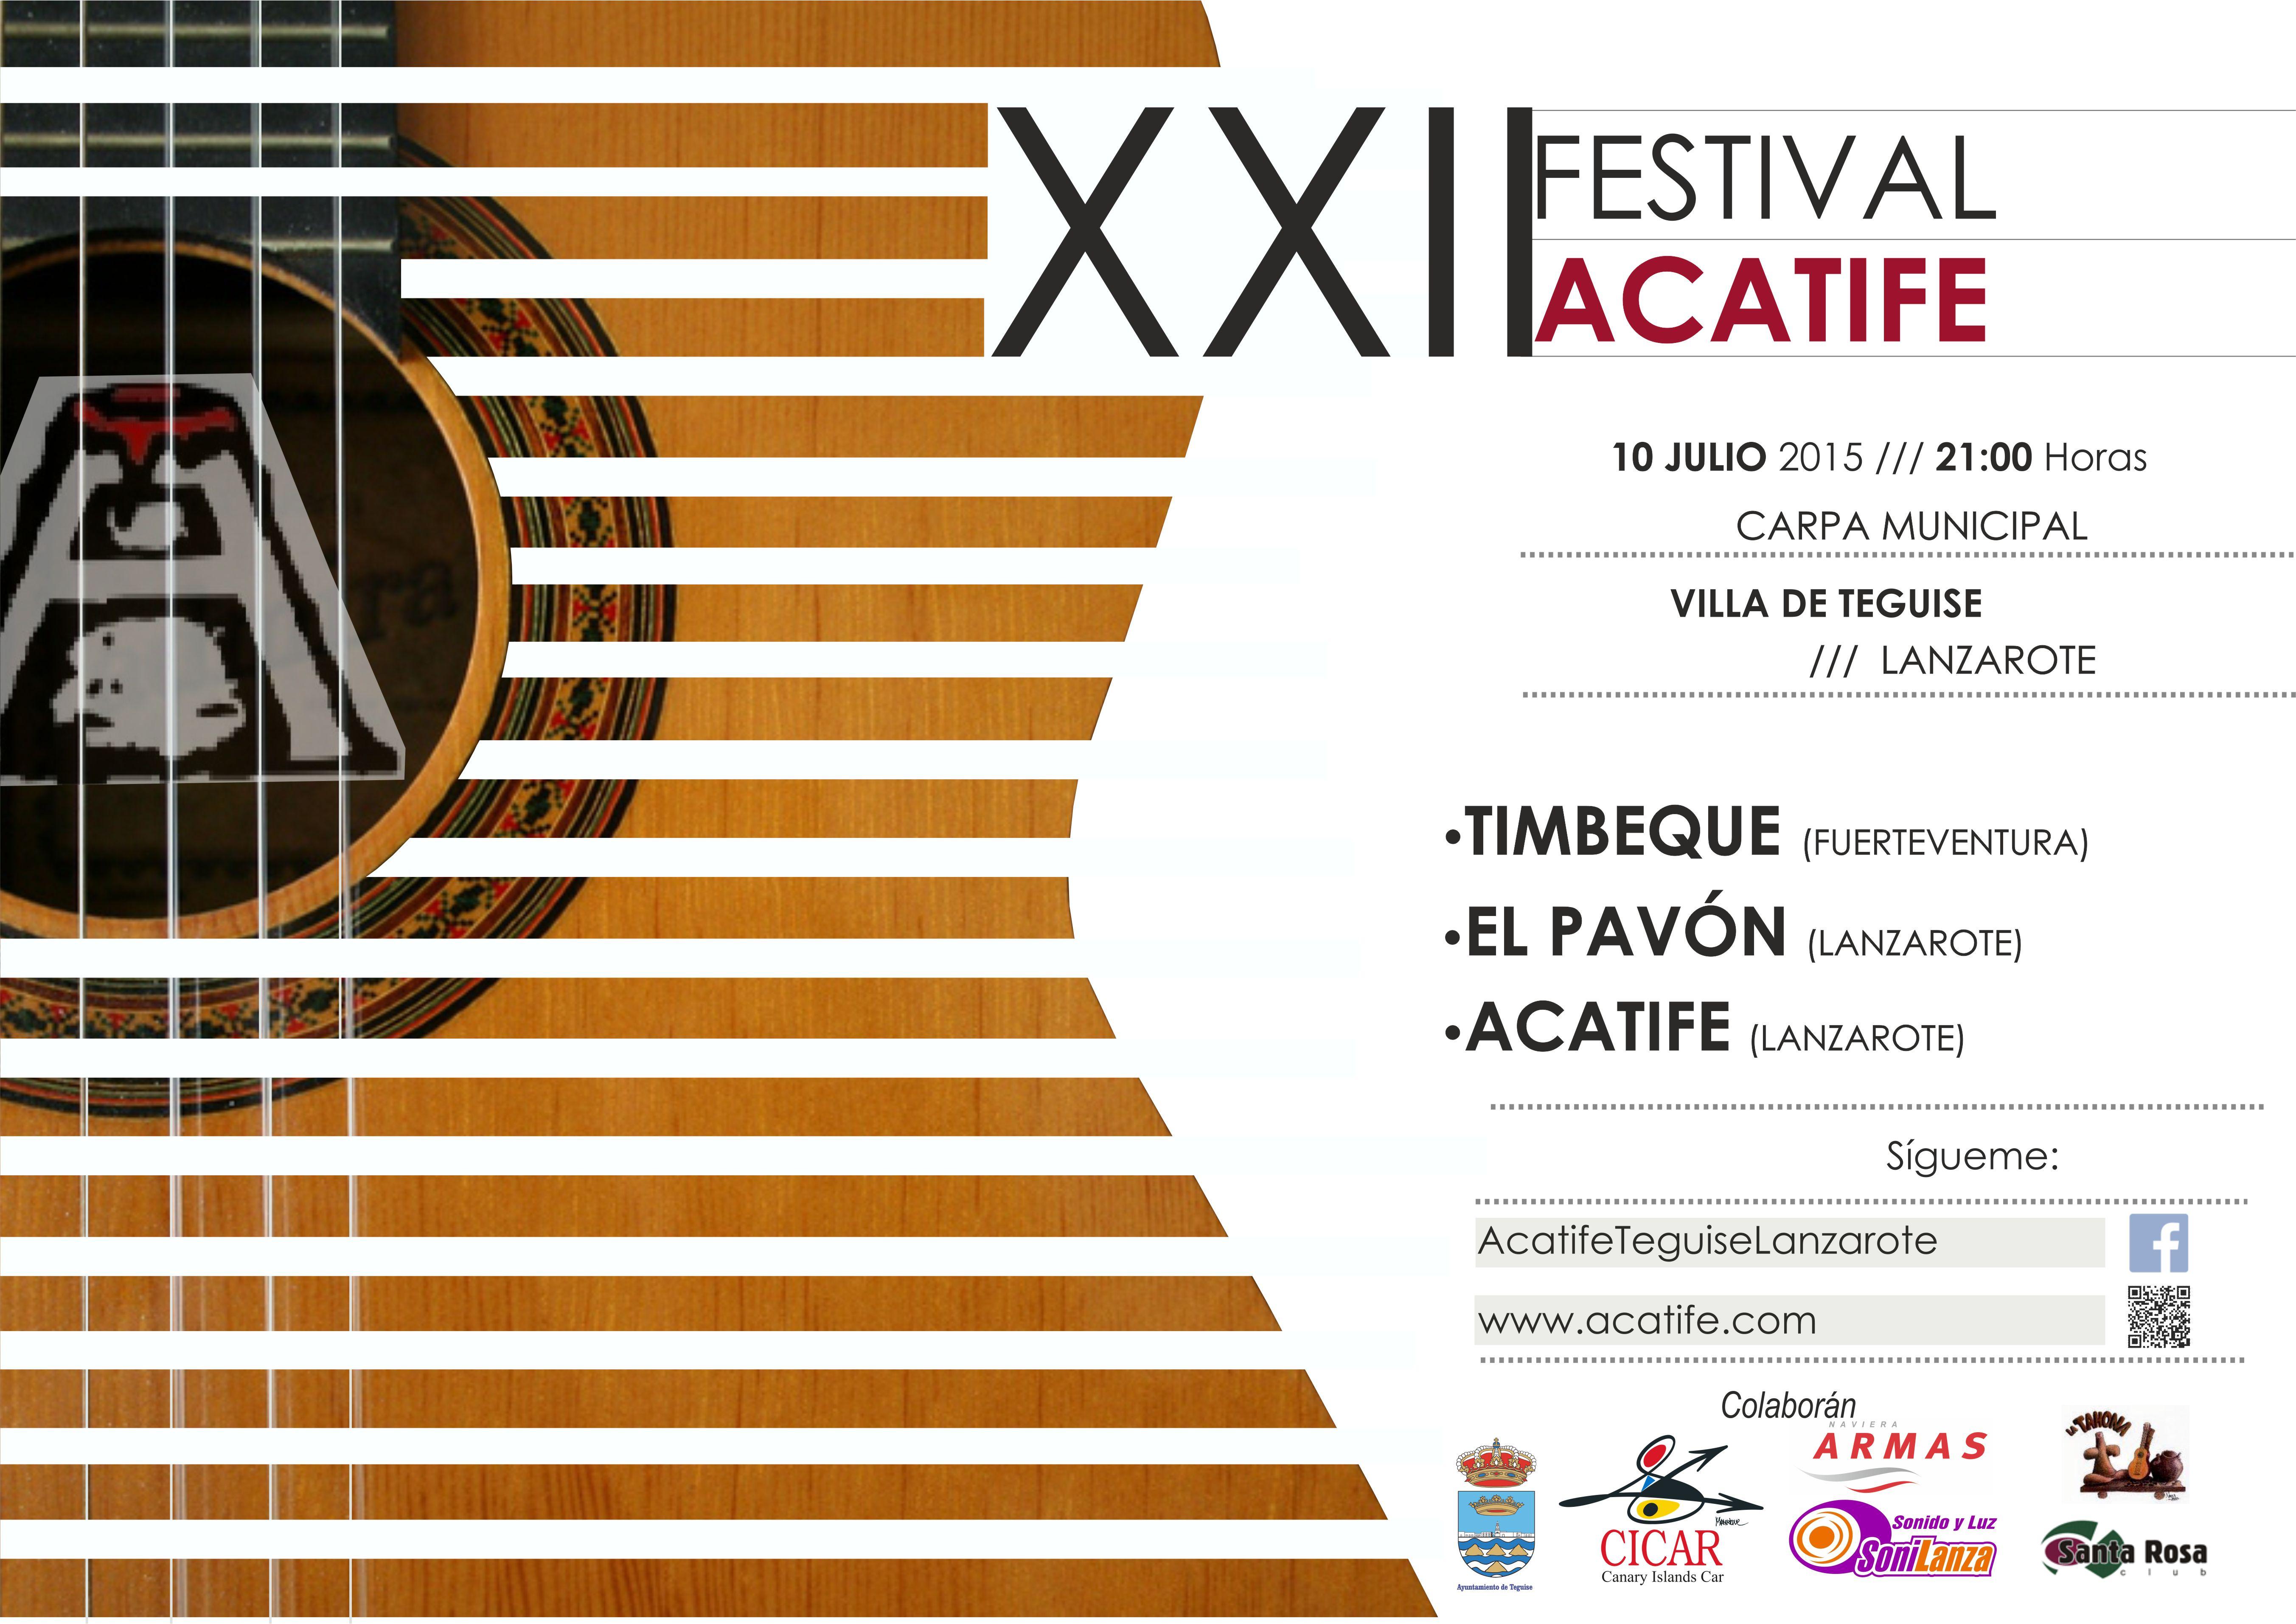 XXII Festival Acatife